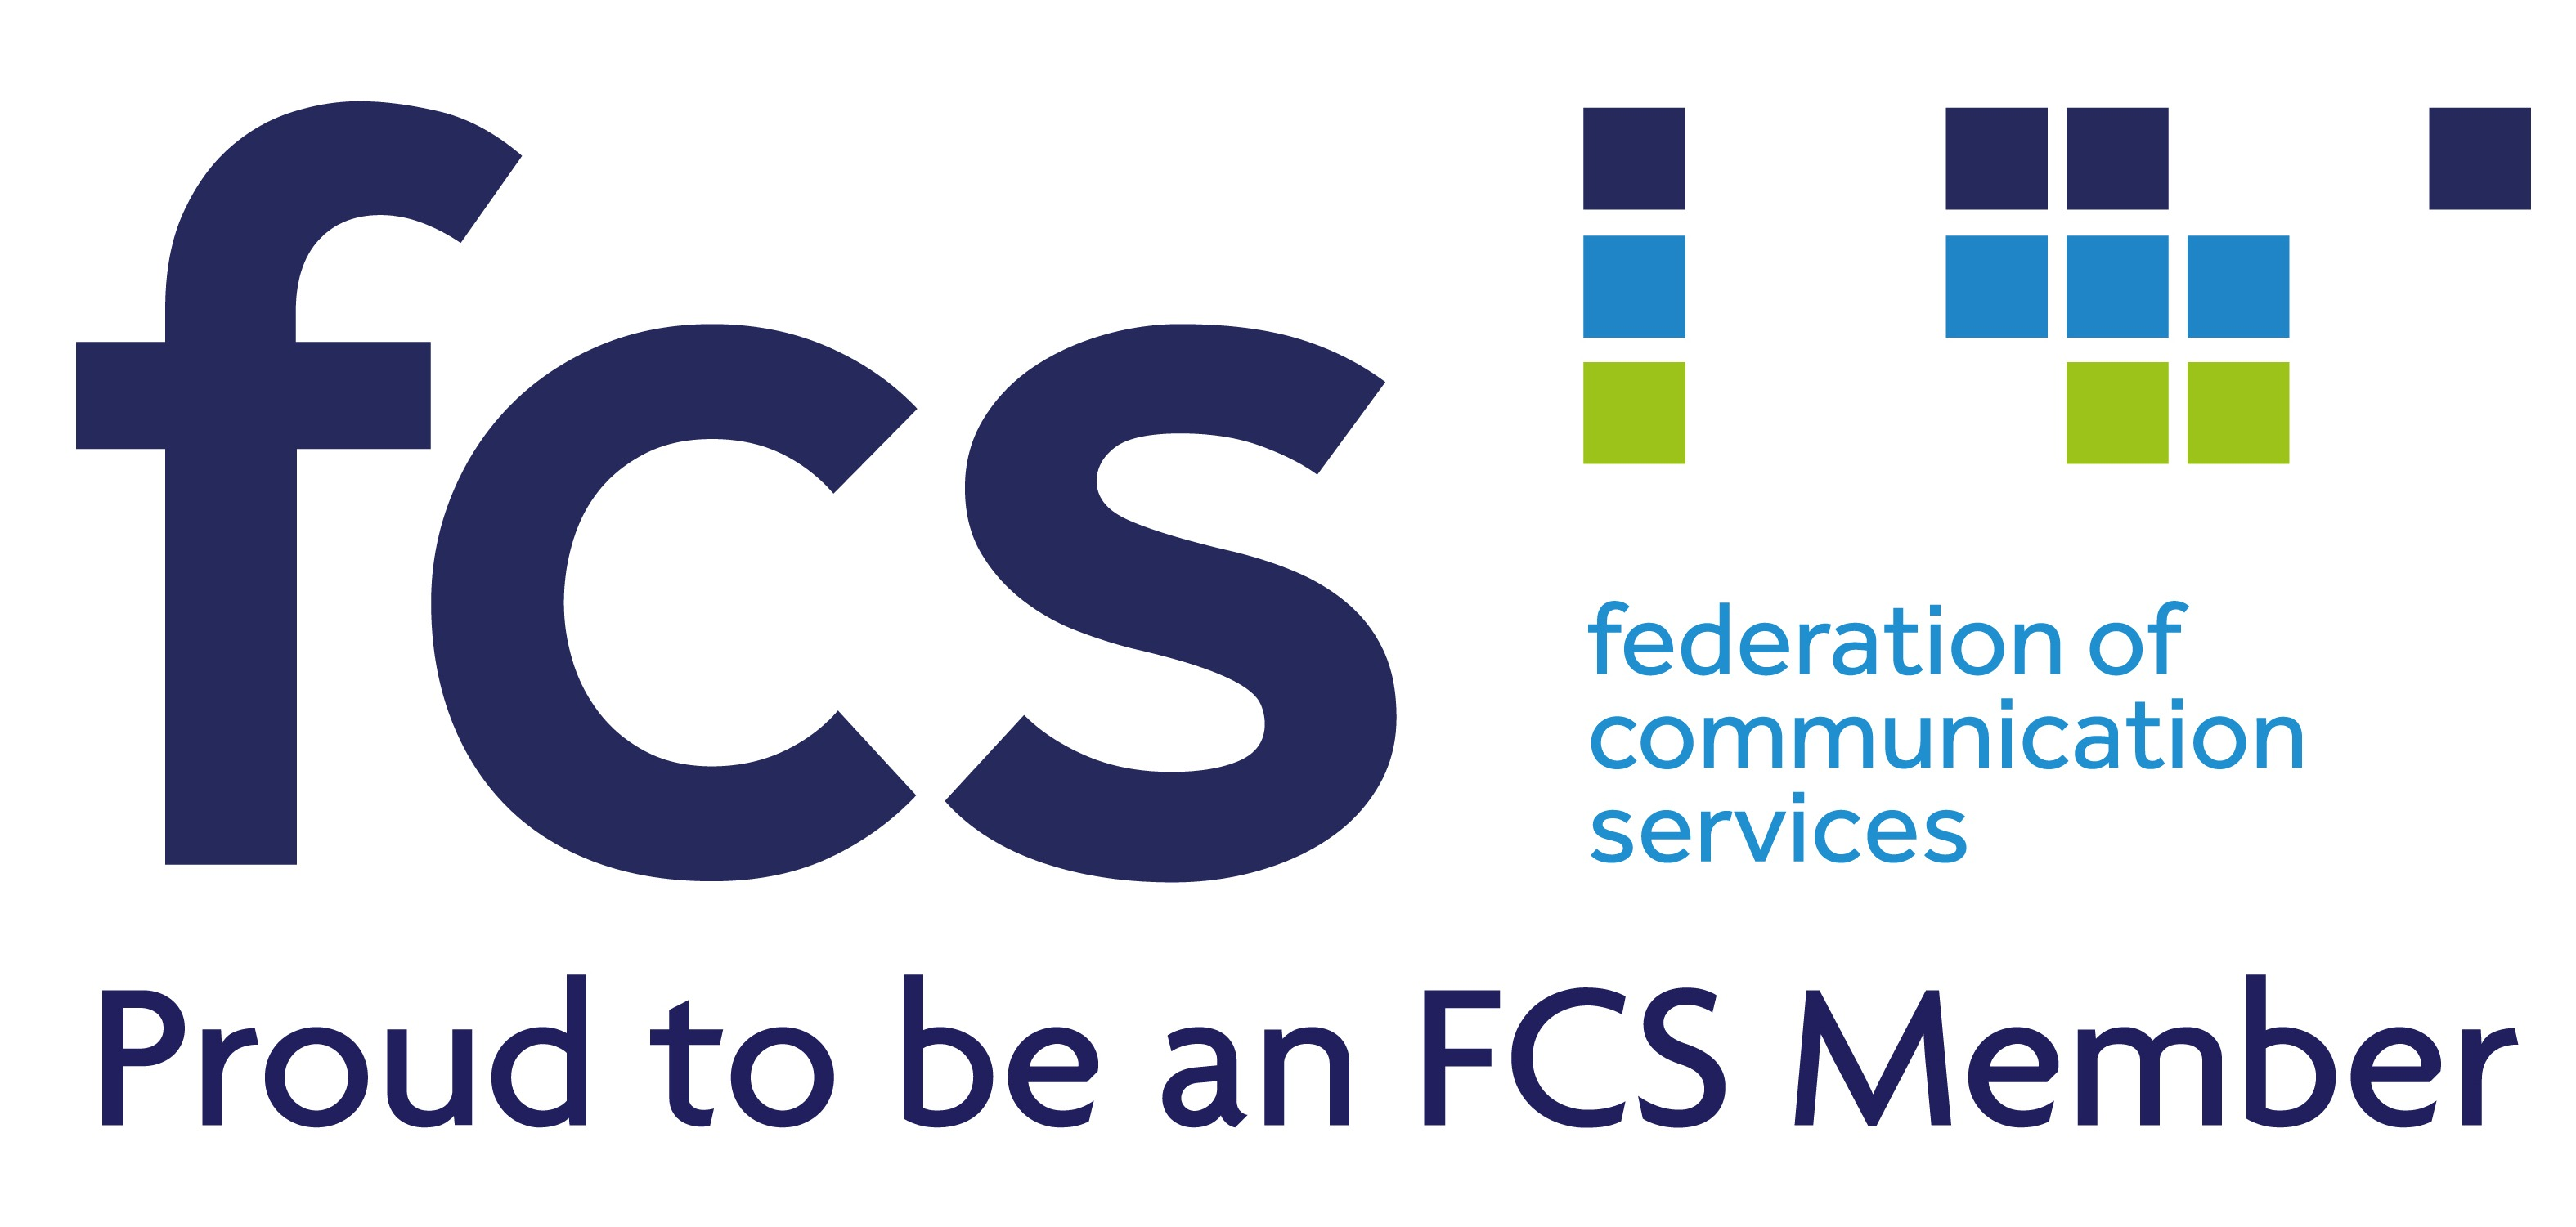 CMM Telecoms FSC Member